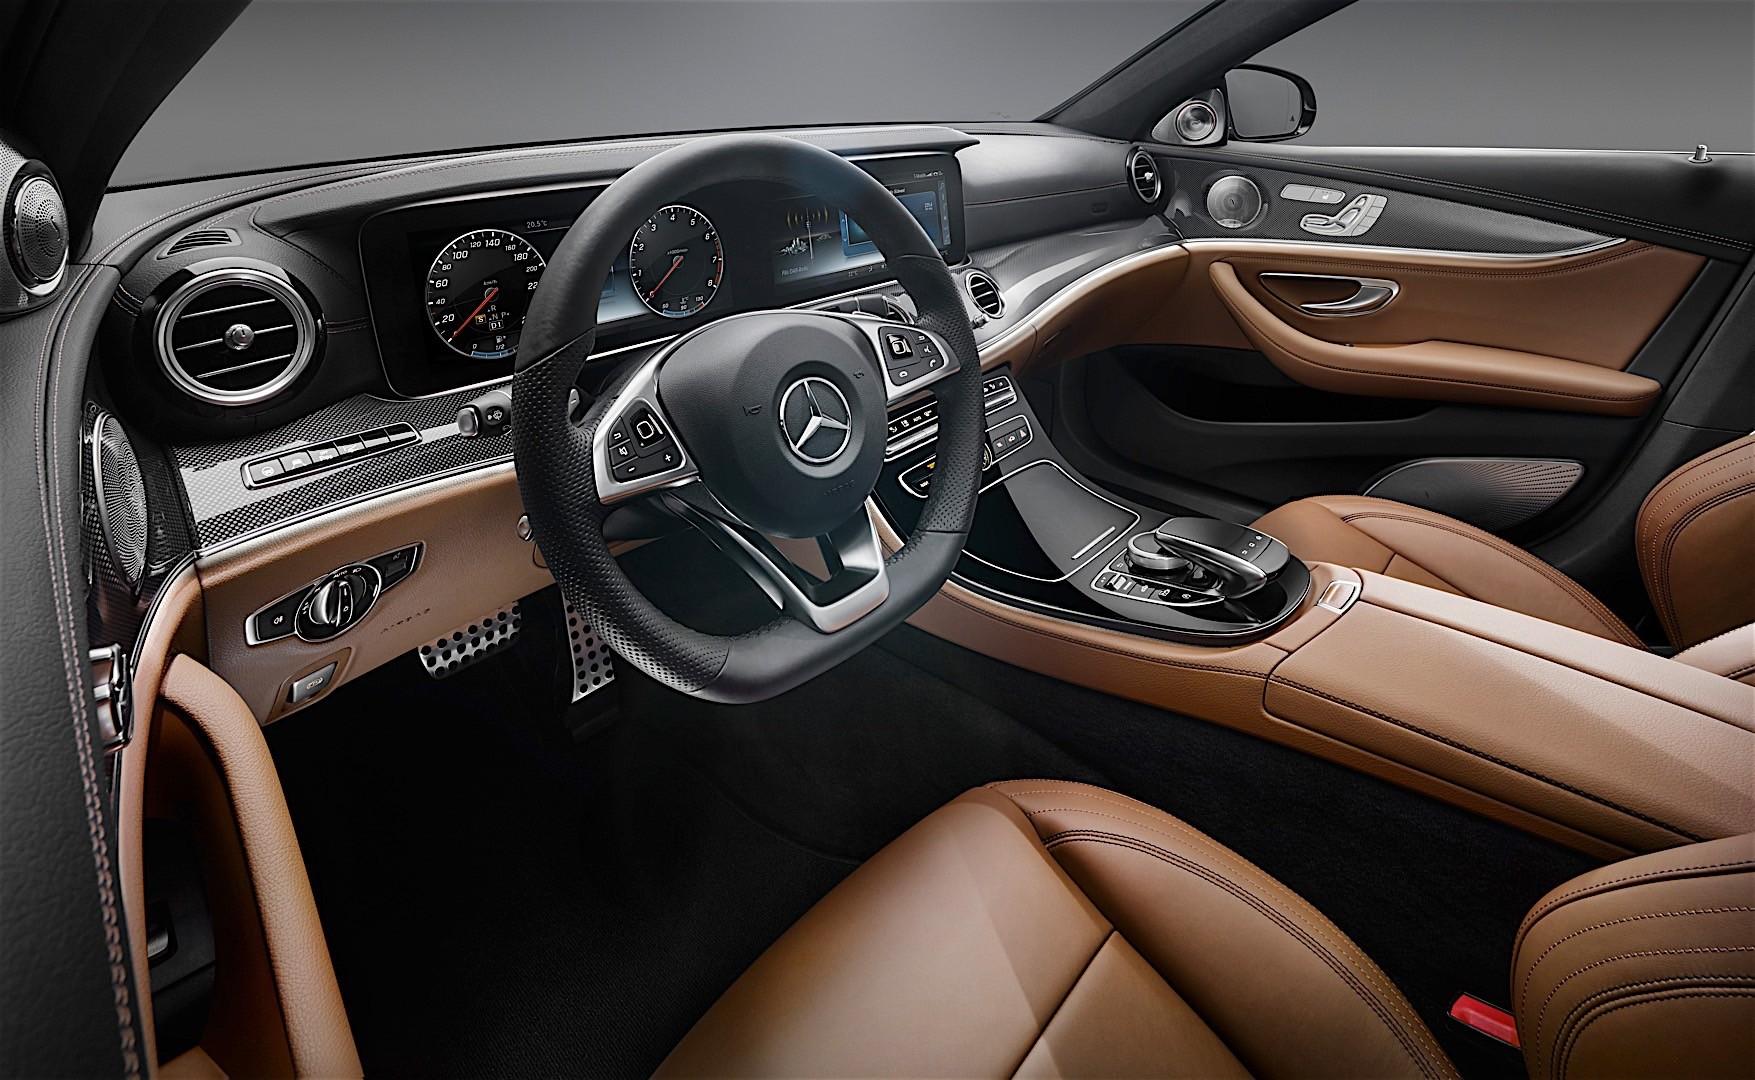 C300 Used 4matic Mercedes